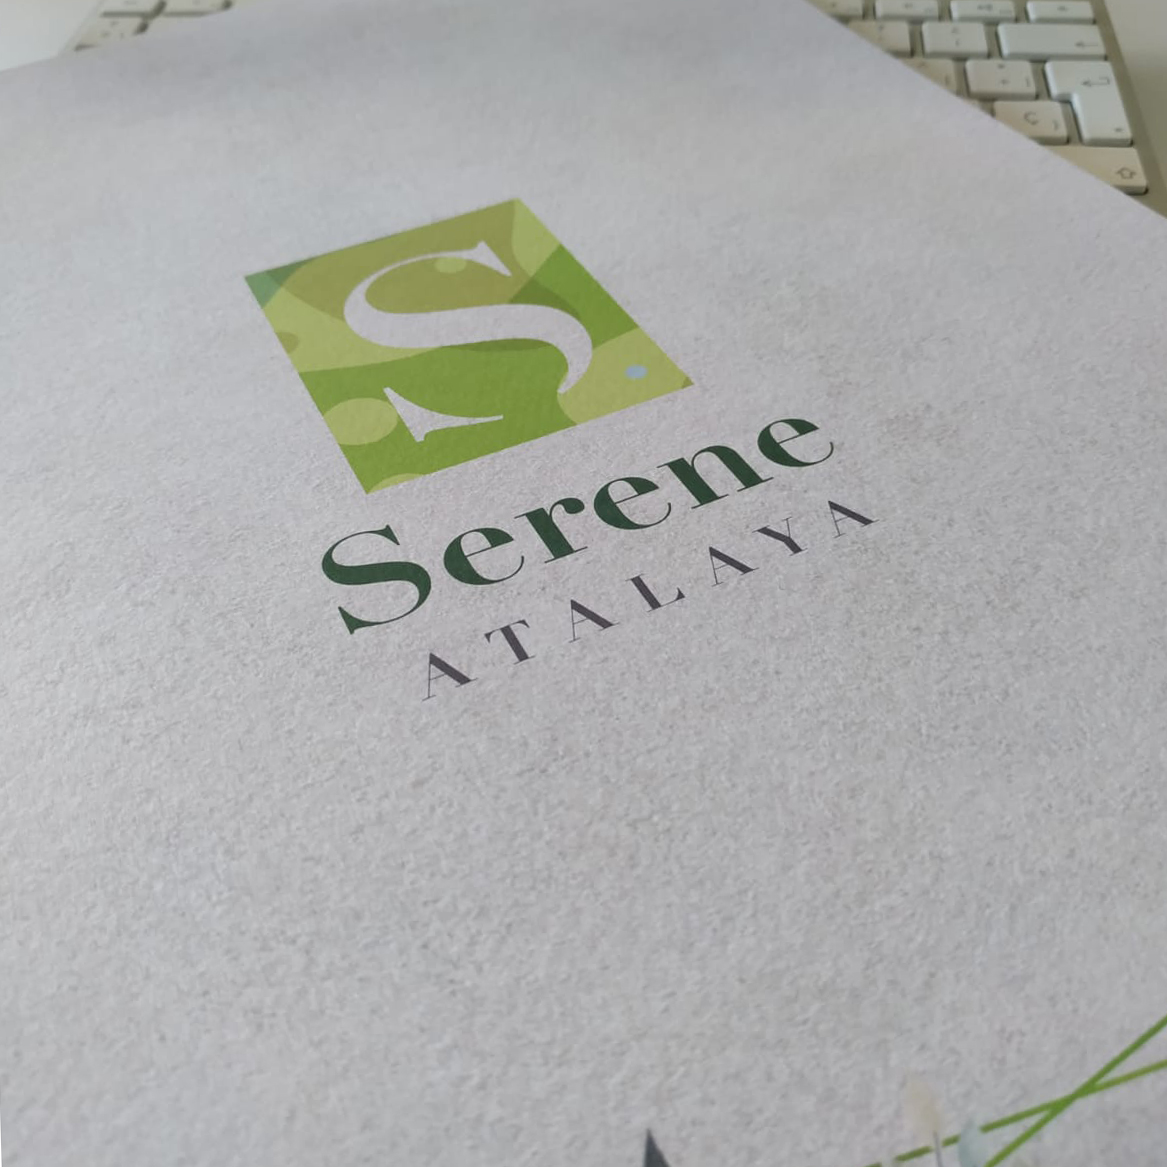 Catálogo para Serene Atalaya – Prime Invest y Metrovacesa